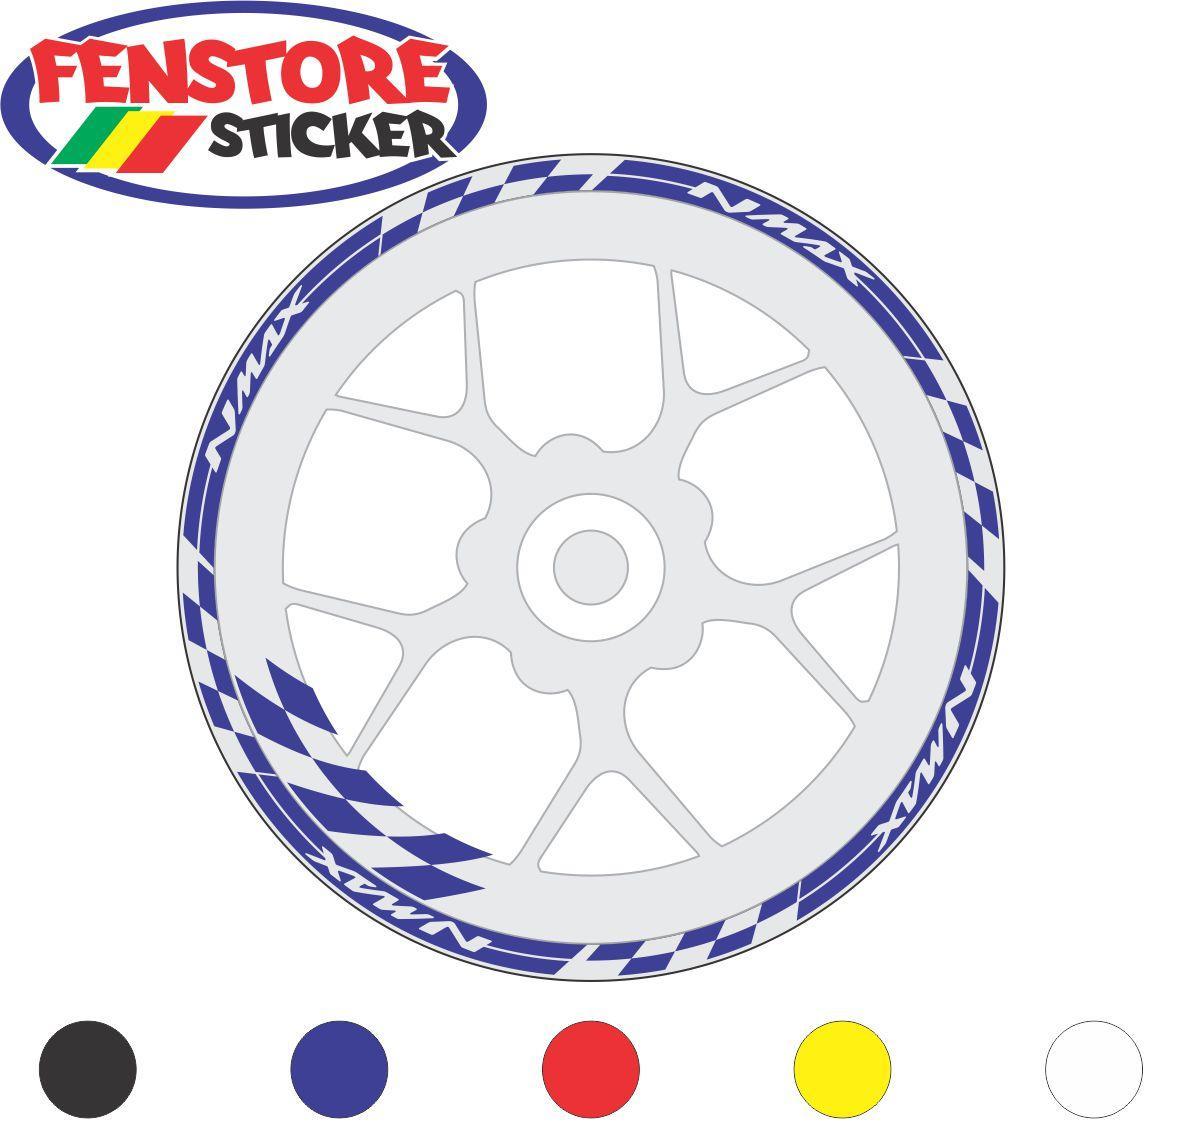 FENSTORE Sticker Cutting -  Aksesoris Motor Stiker Velg Yamaha Nmax 13br  -  FENSTORE sticker